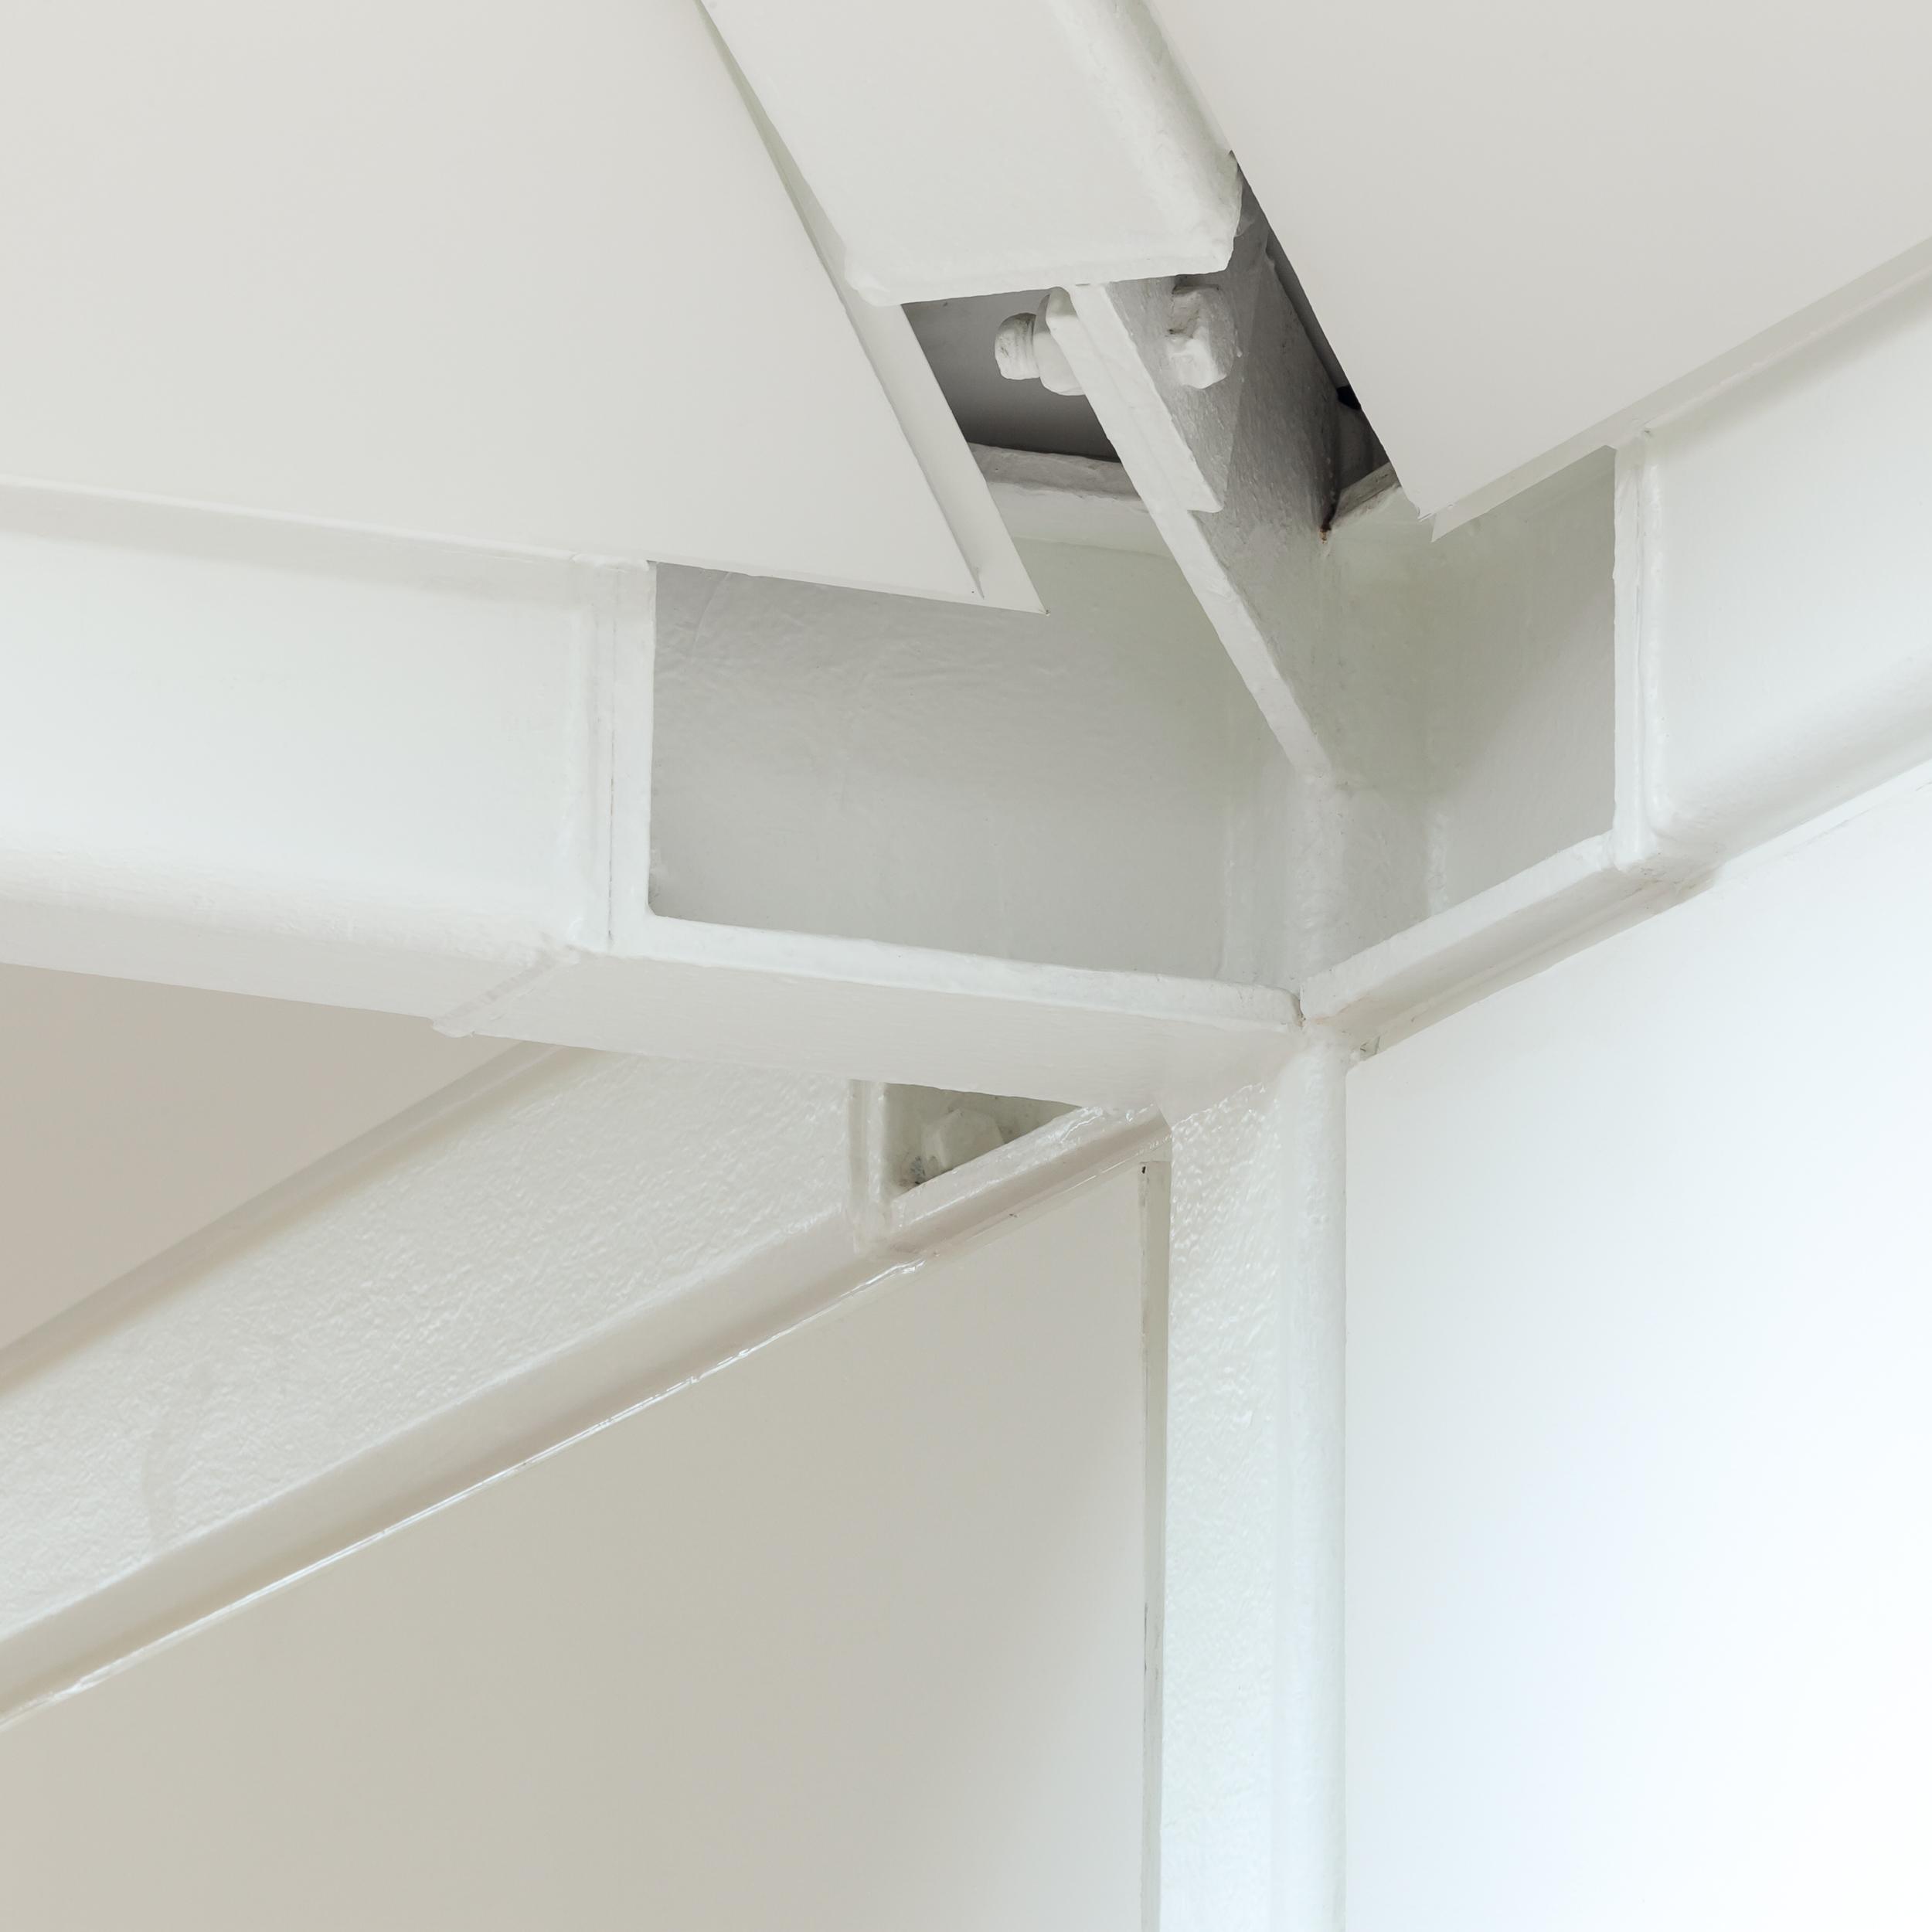 IMG_2099-Edit - 210318_Mailen_Design_Domus_Battersea - Website.jpg